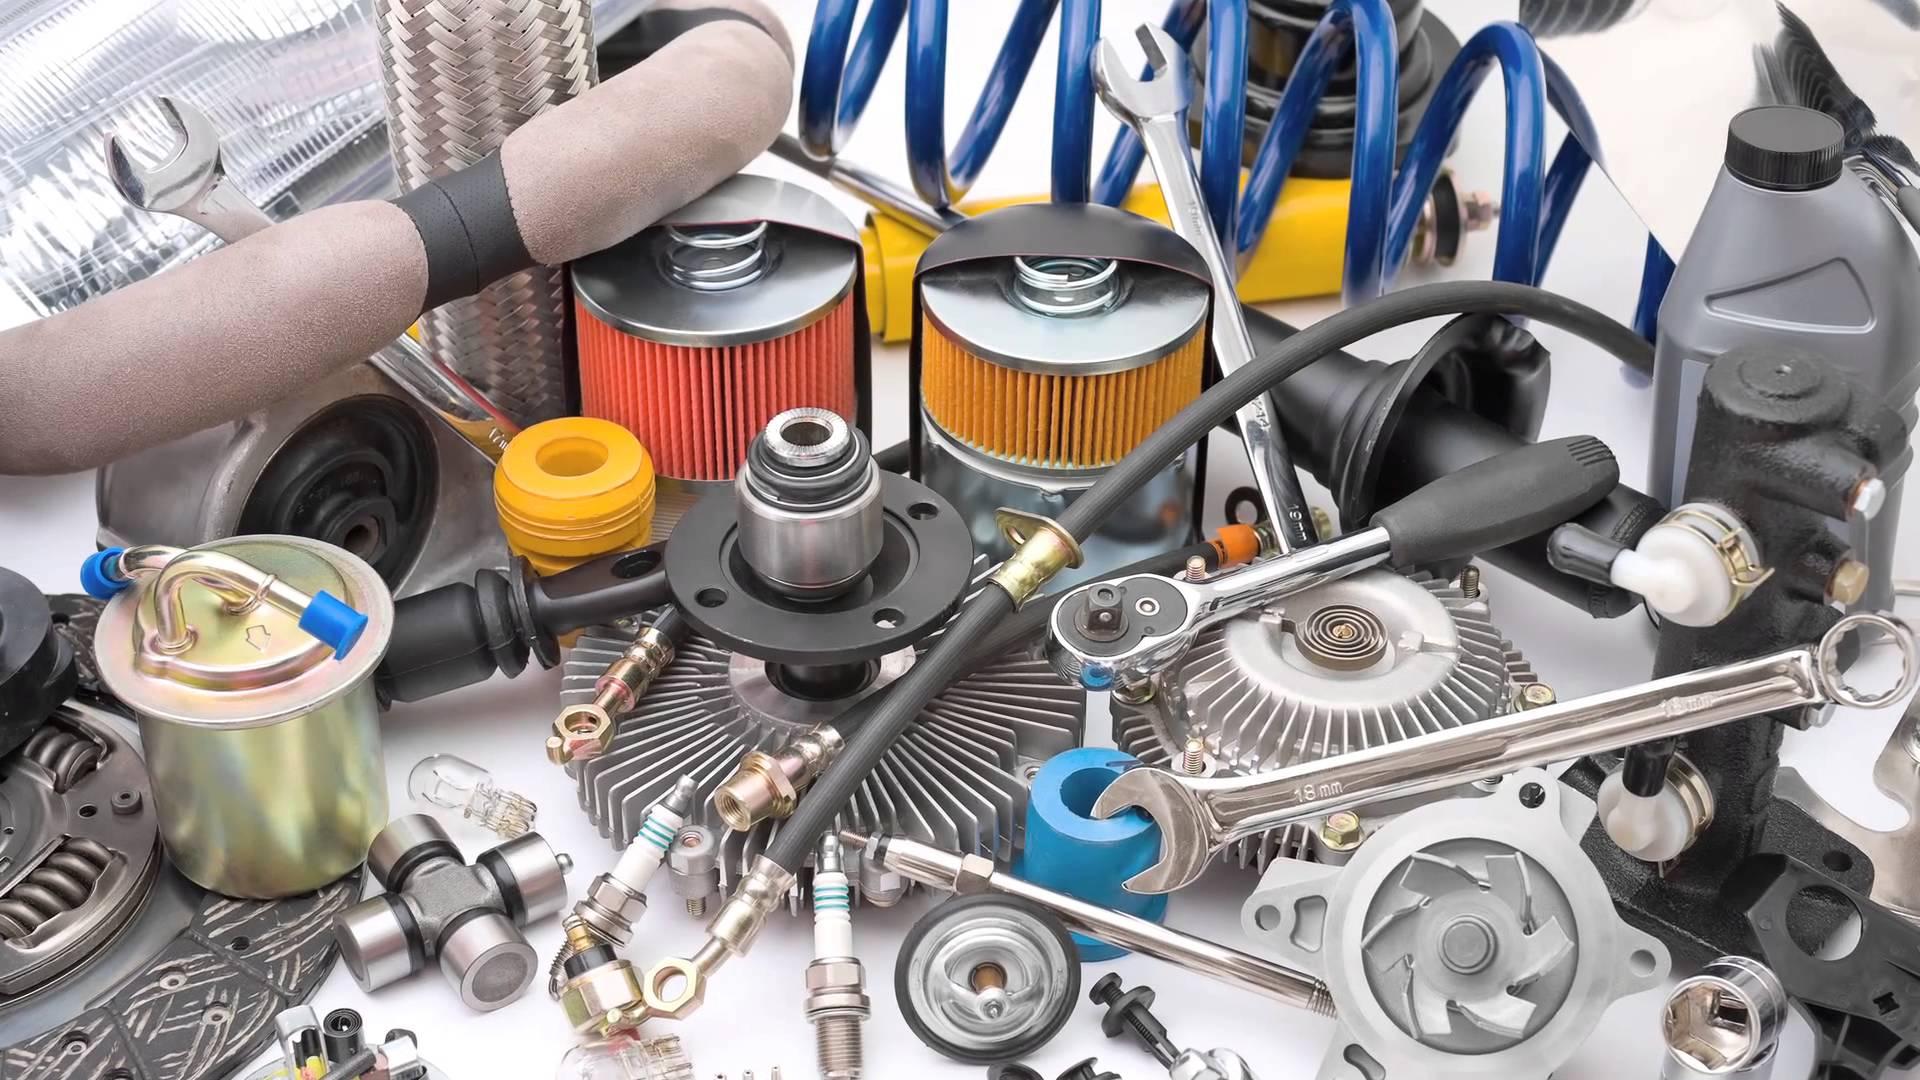 Engines Valrico, FL - Brandon Auto Services